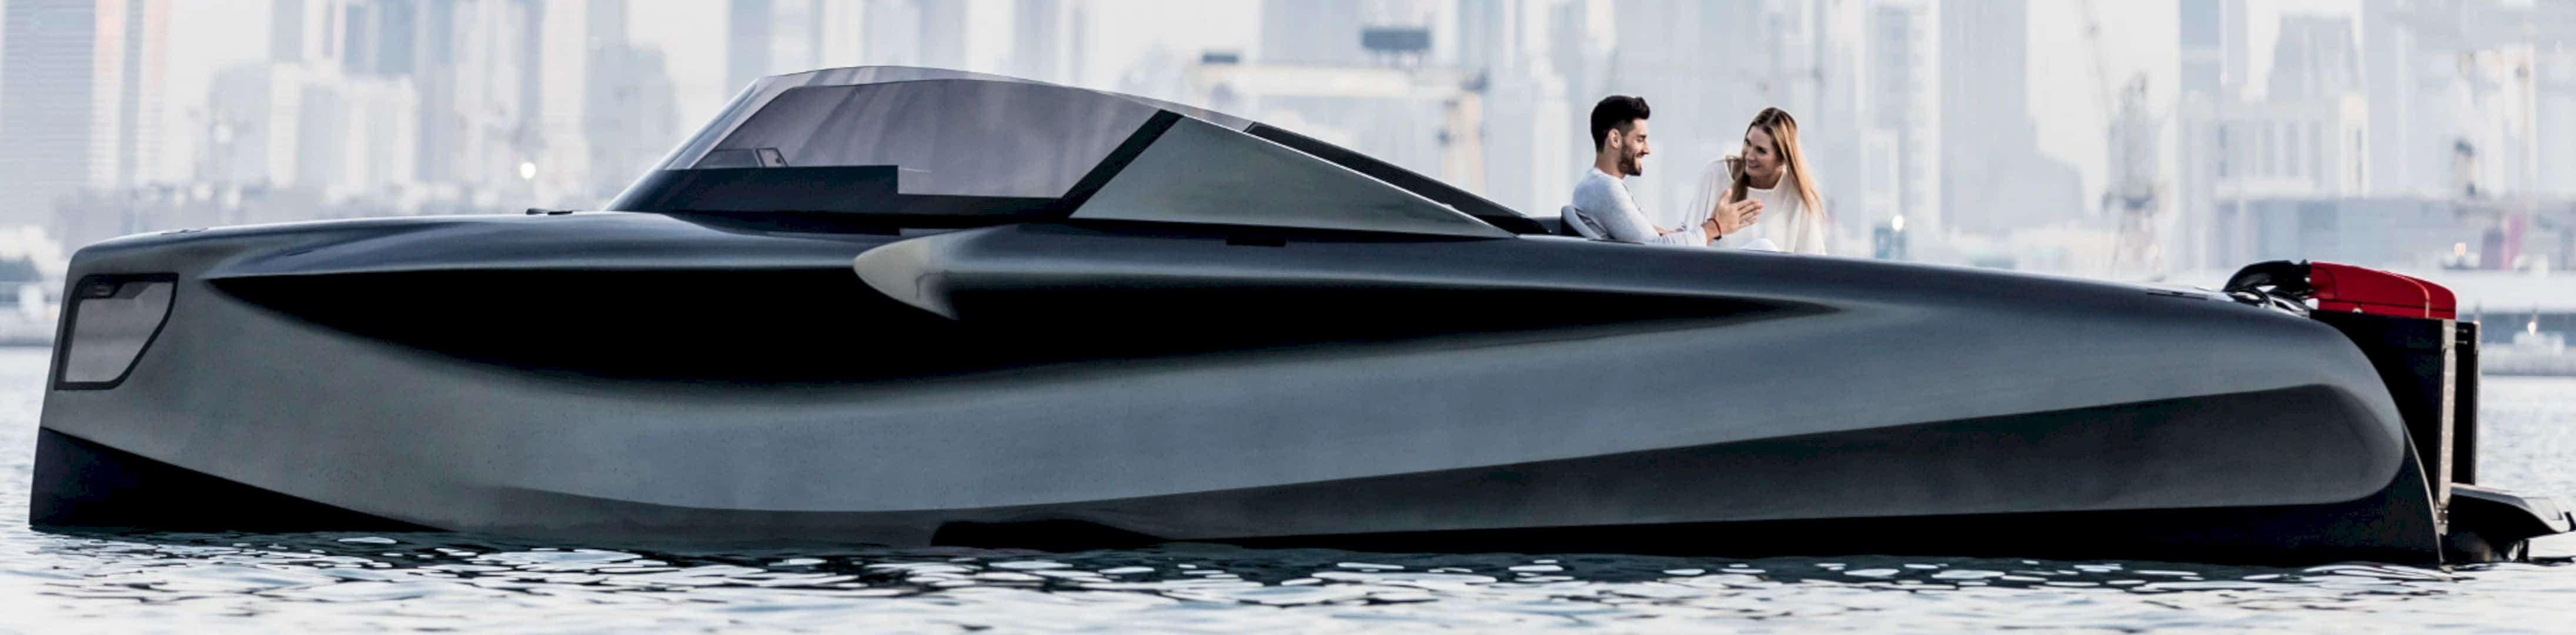 FOILER Boat 2